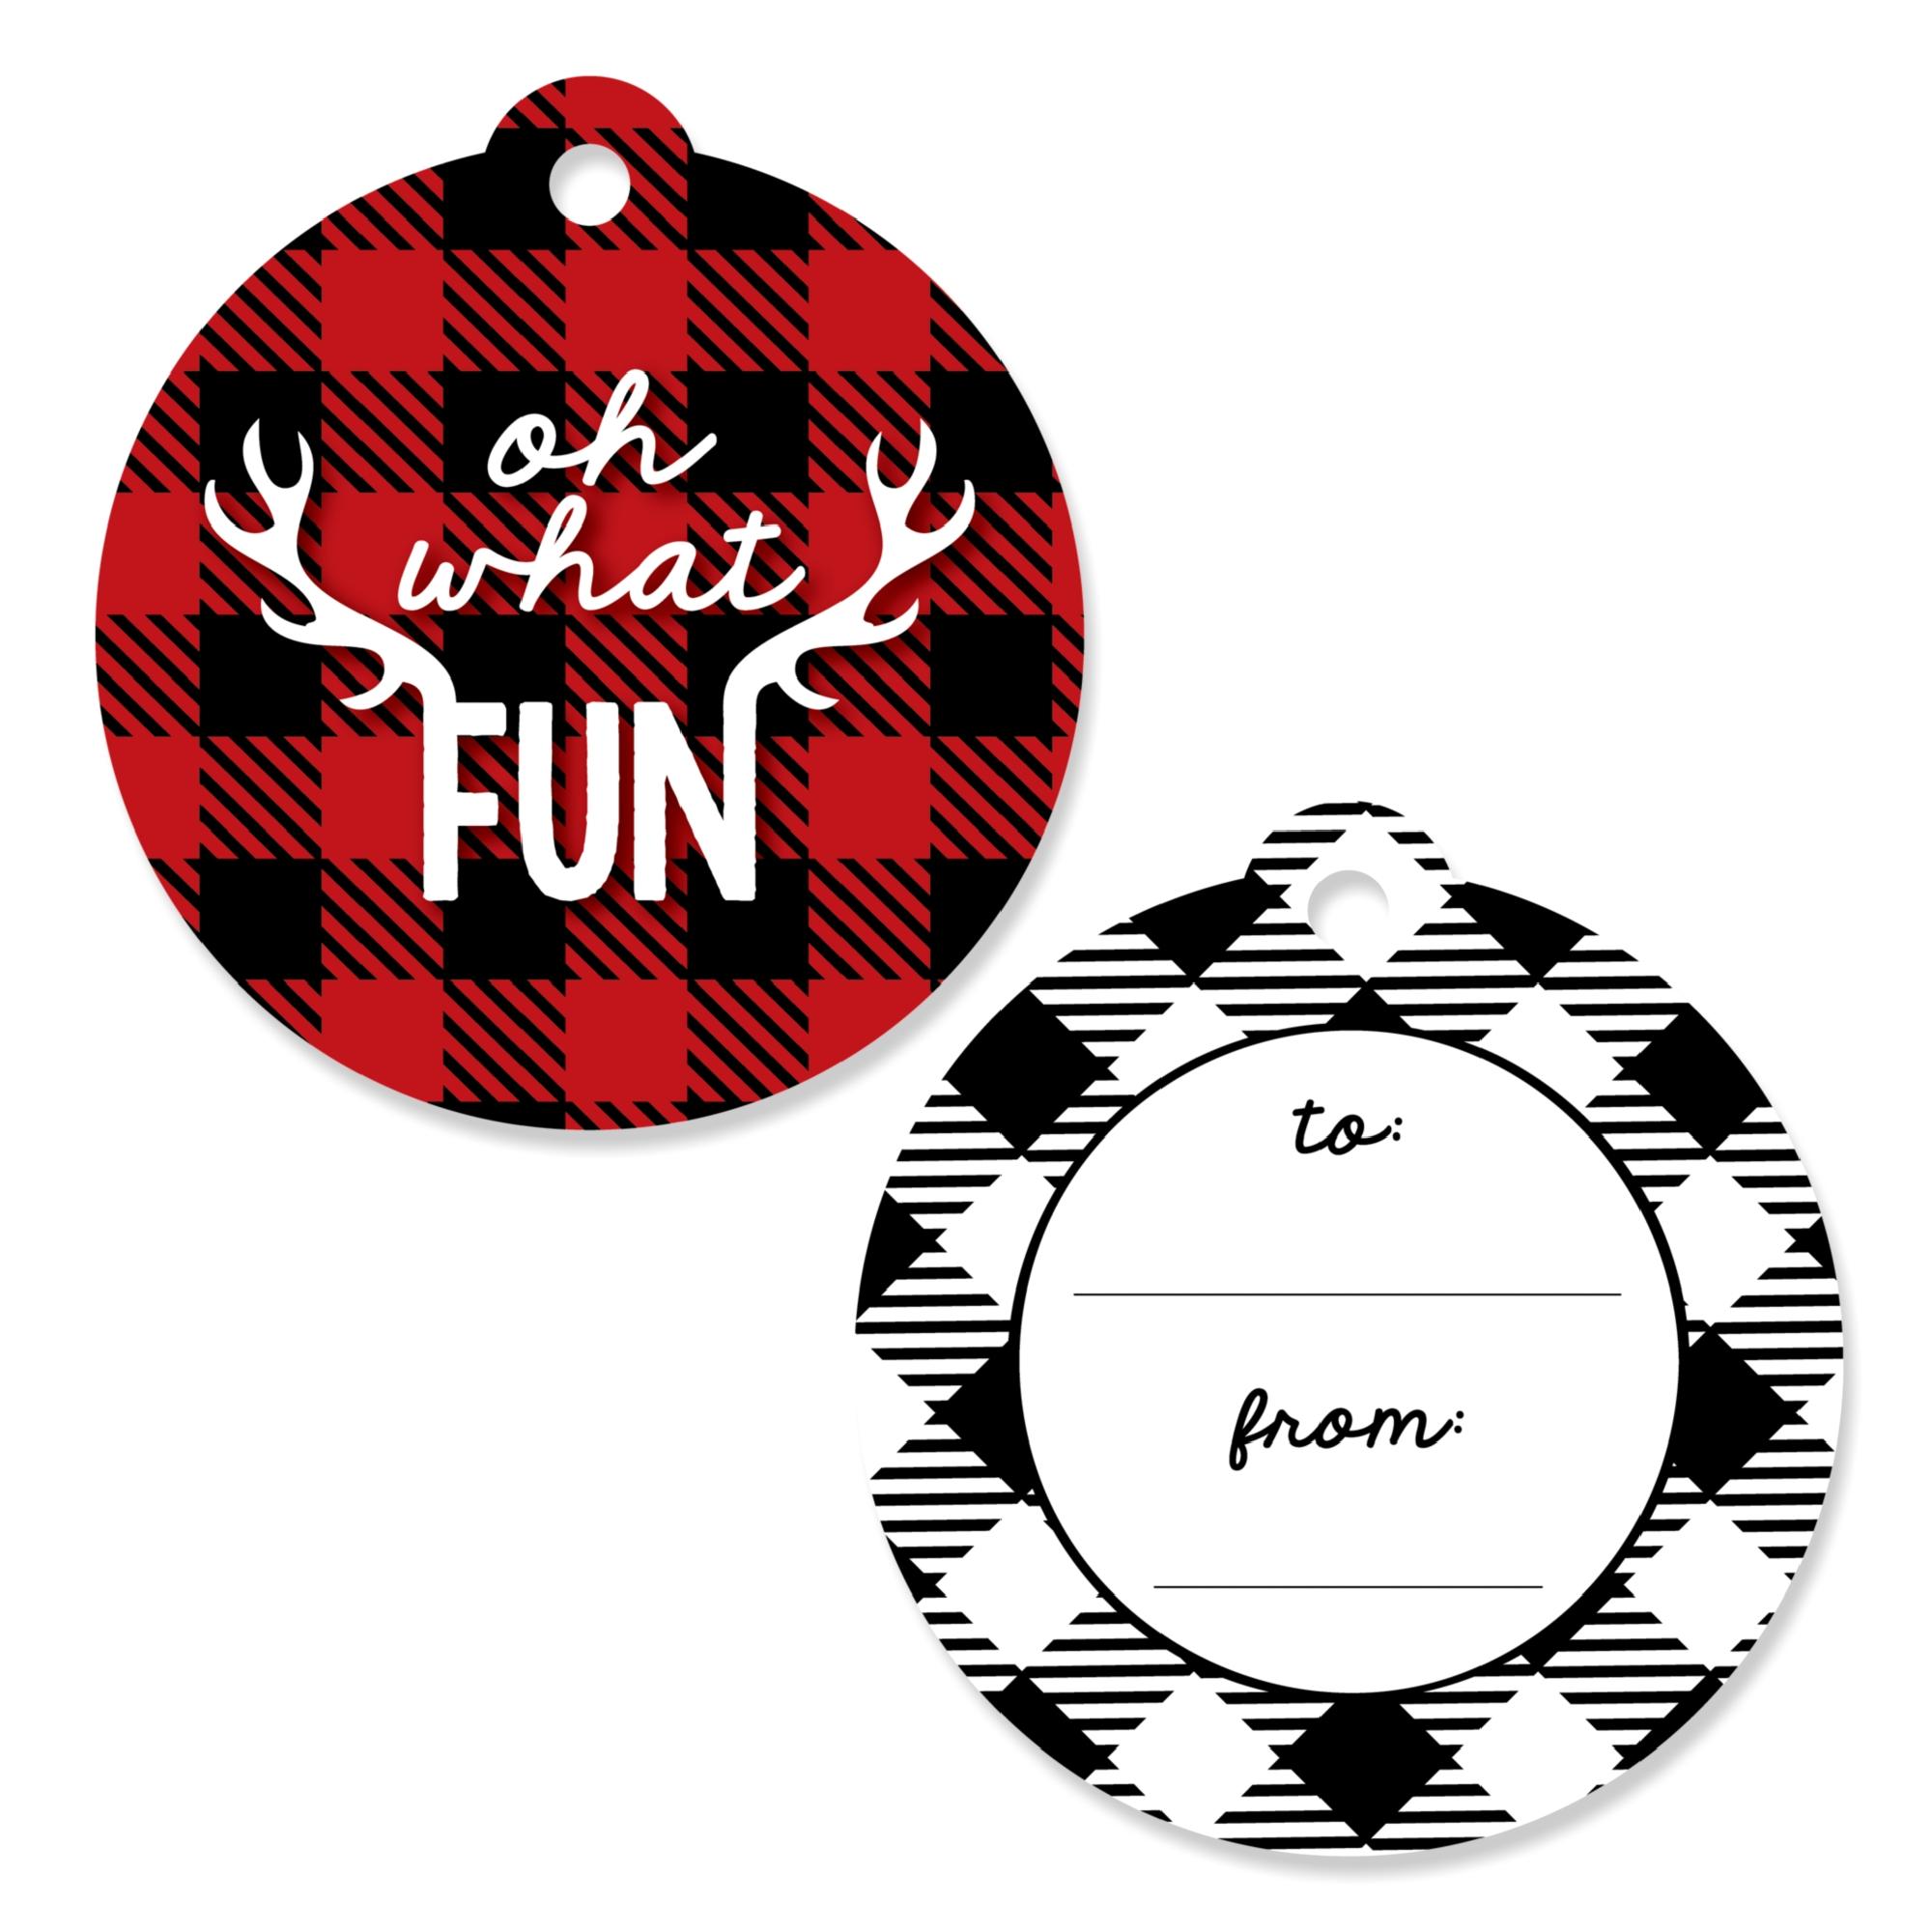 Prancing Plaid - Christmas & Holiday Buffalo Plaid Party Favor Gift Tags - Set of 20